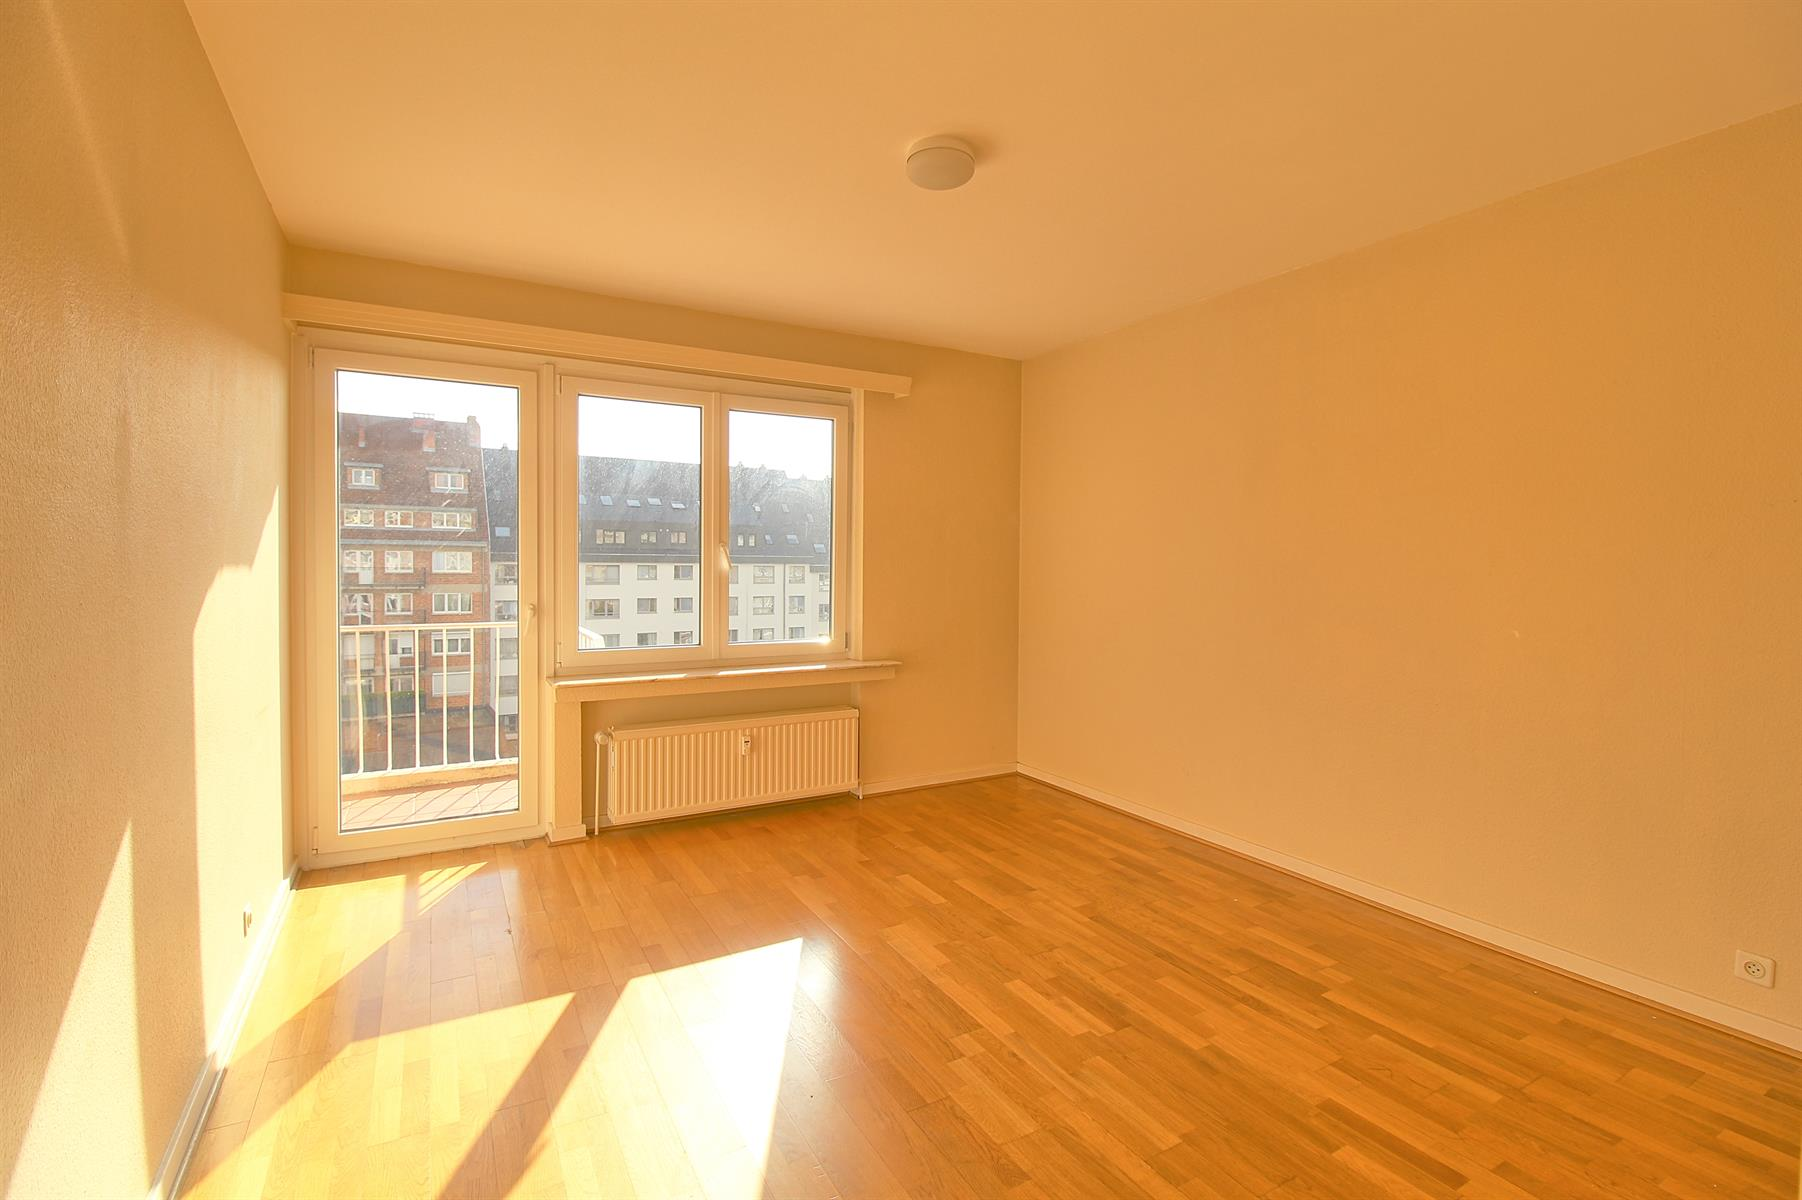 Appartement - Woluwe-Saint-Lambert - #4183448-2